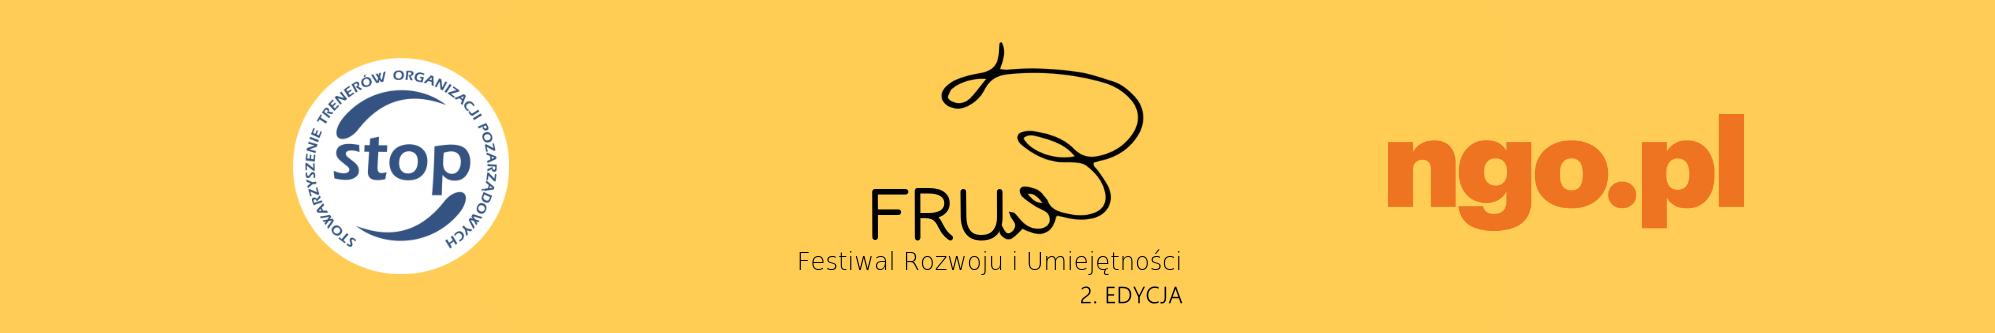 Loga - STOP FRU NGO.PL